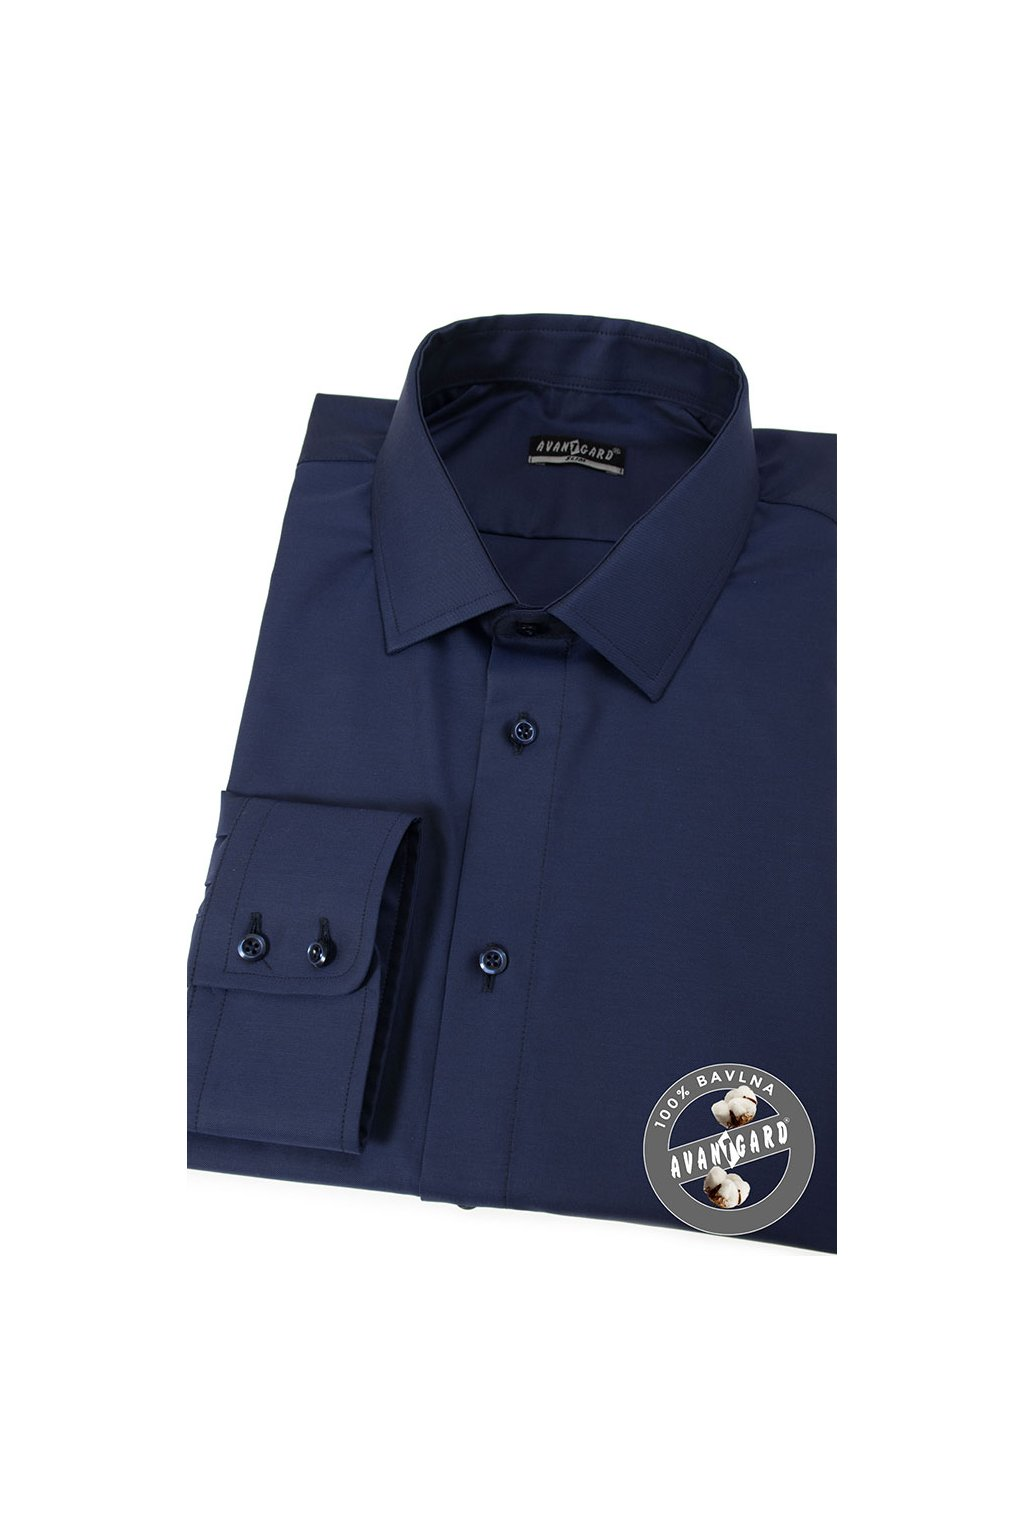 Pánská košile SLIM modrá 109 - 5508